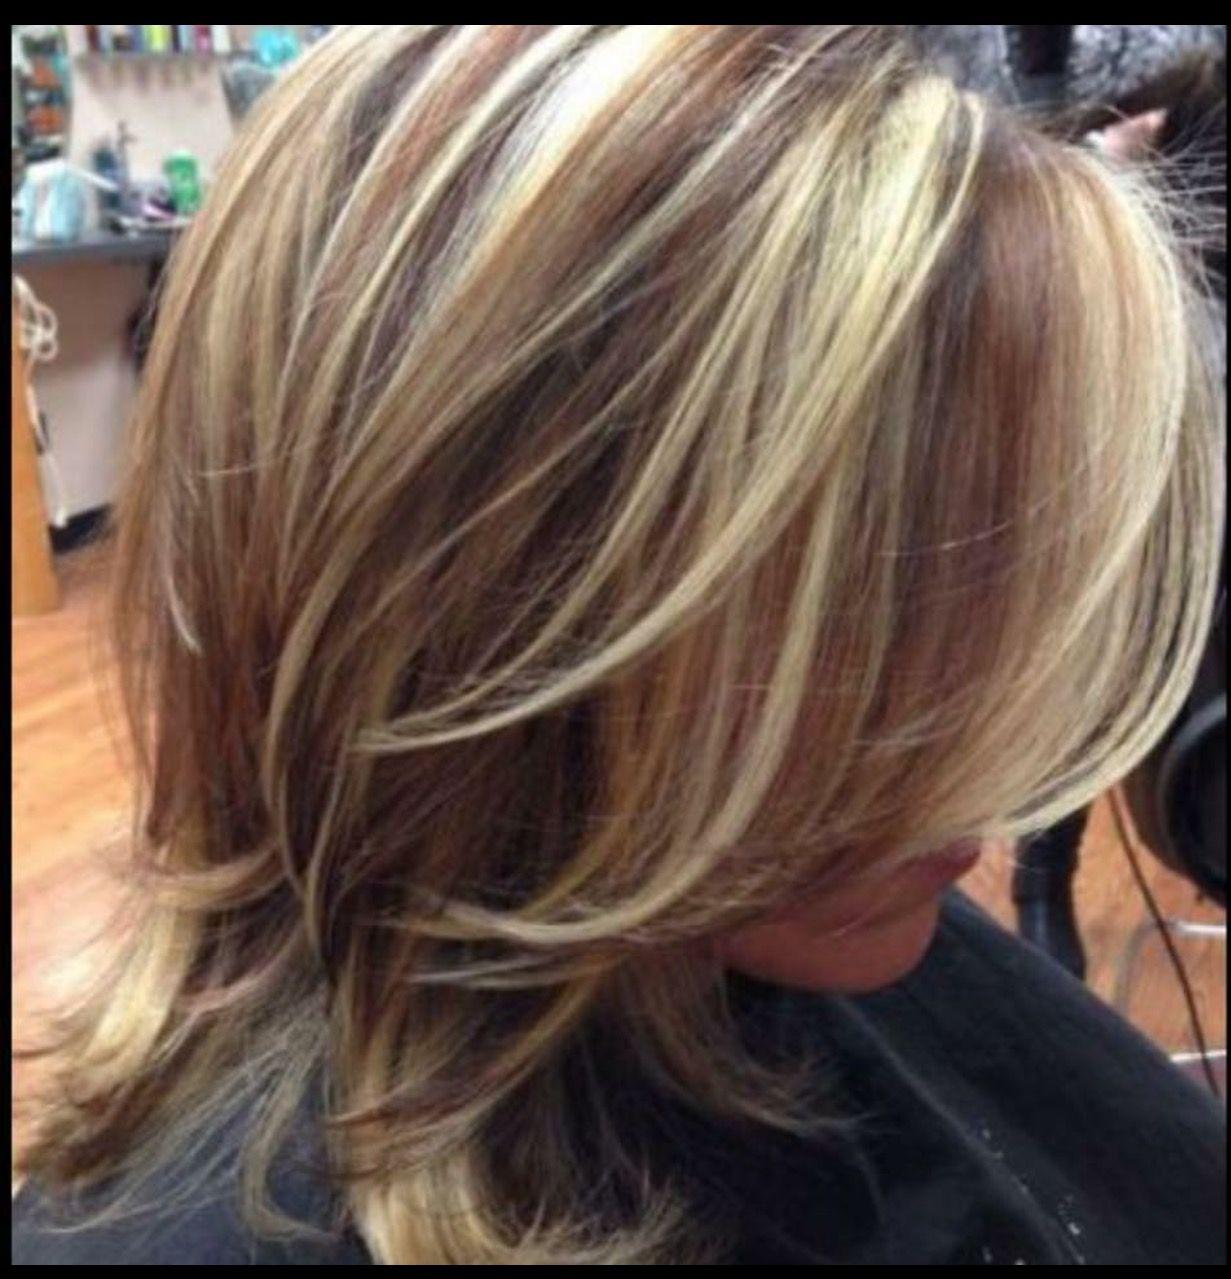 Pin by Monica Rios Arce on Hair Styles / Highlights | Hair ...